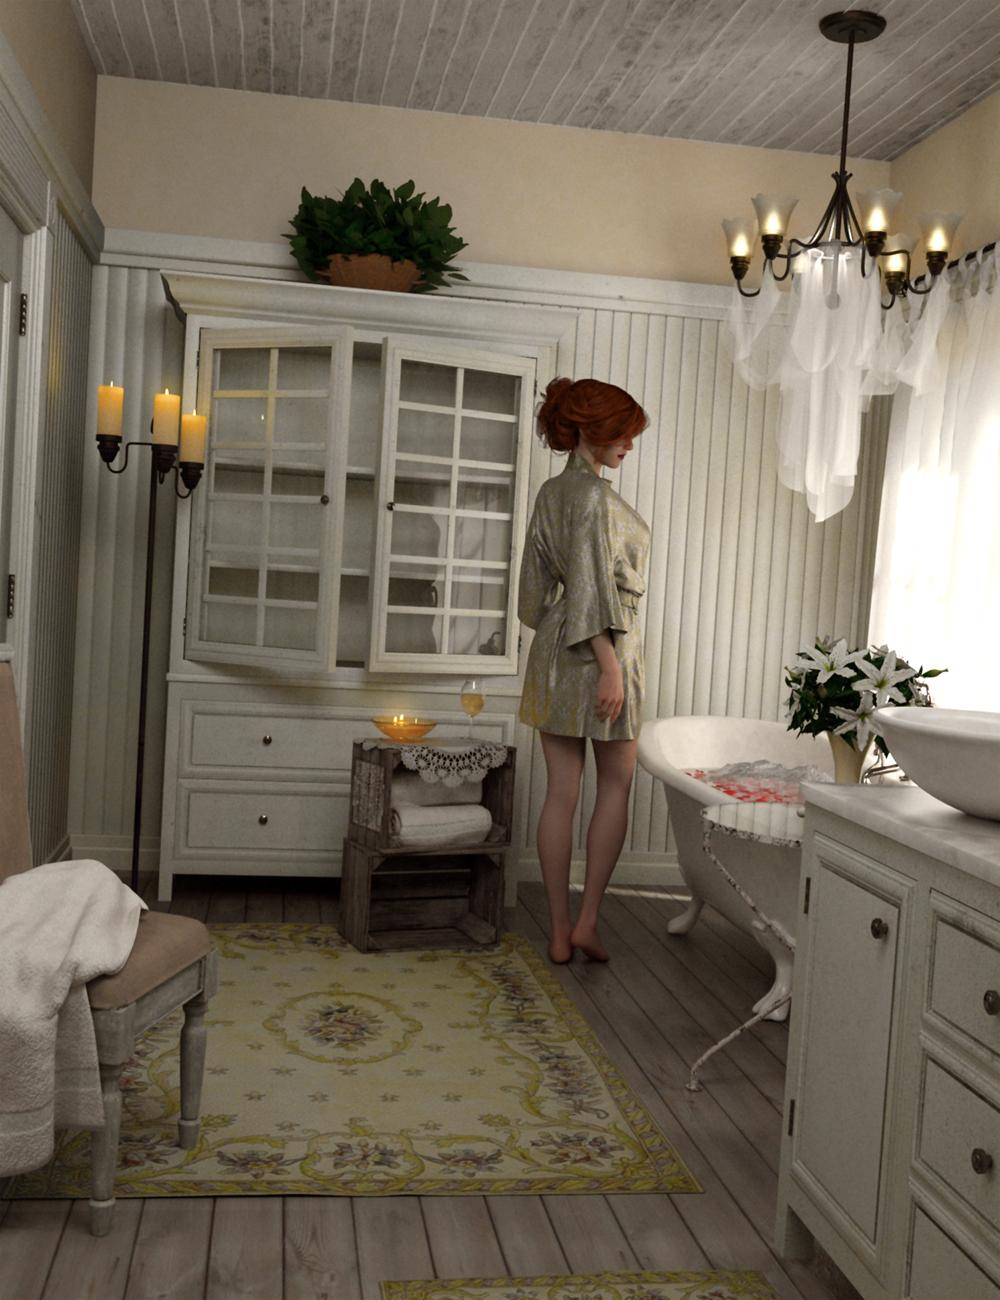 Woodman House: The Bathroom by: SloshWerks, 3D Models by Daz 3D